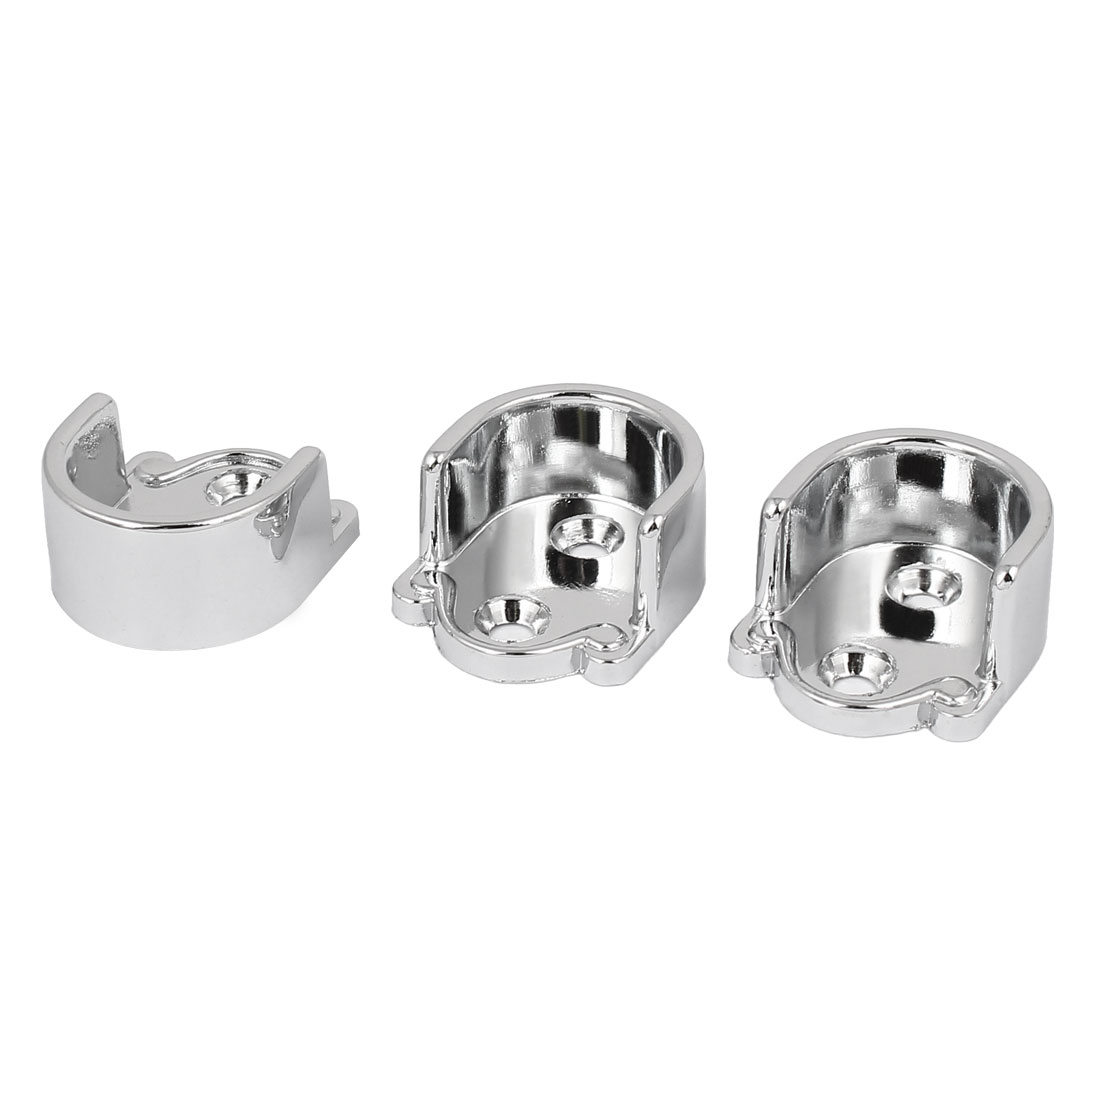 Wardrobe Closet Zinc Alloy Rail Rod End Bracket Support Silver Tone 22mm 3pcs